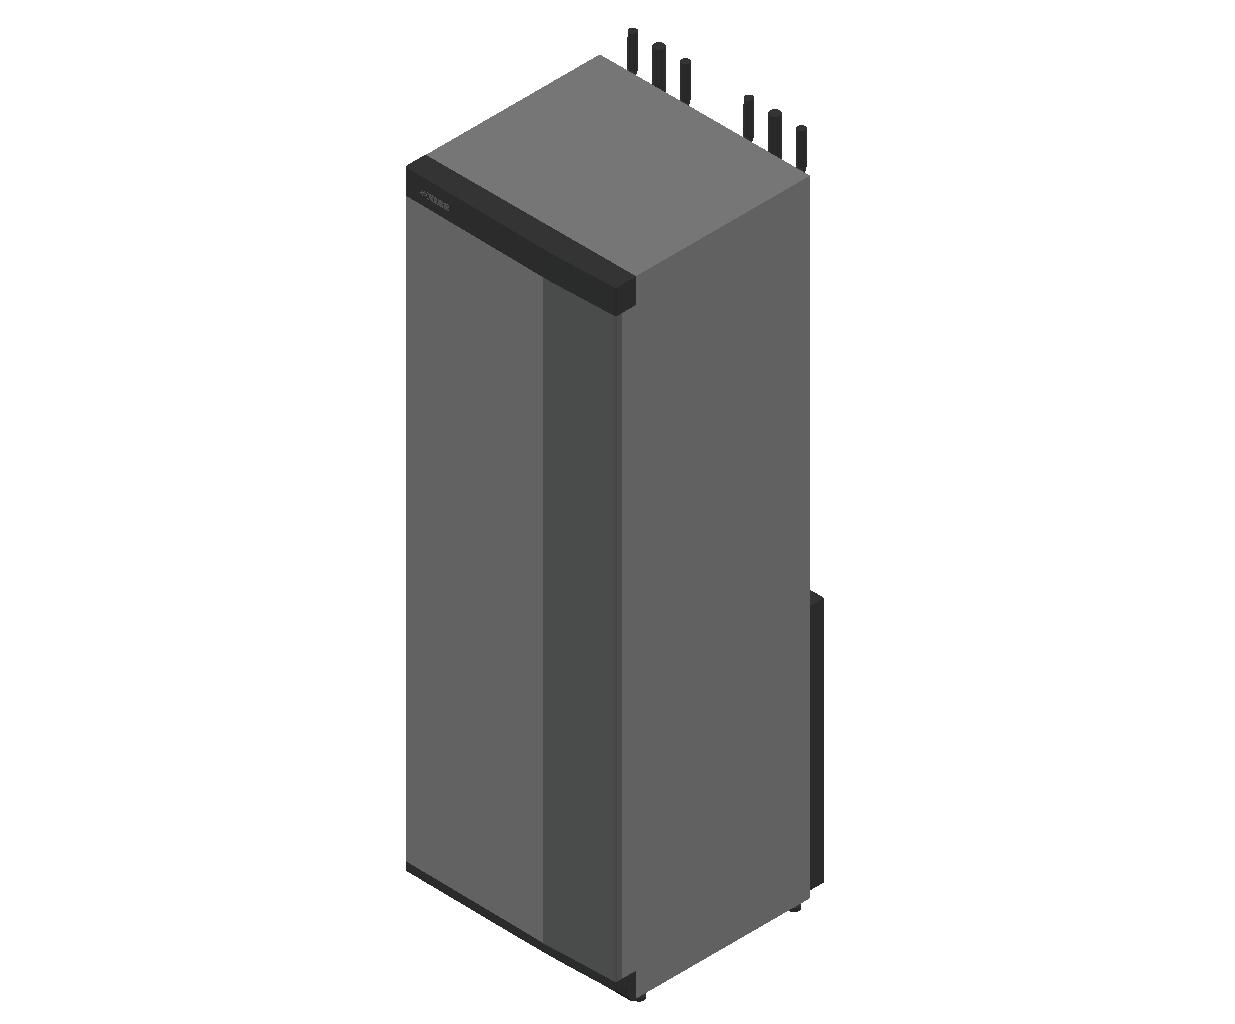 HC_Heat Pump_MEPcontent_NIBE_S1255PC-6 3x400V_INT-EN.dwg